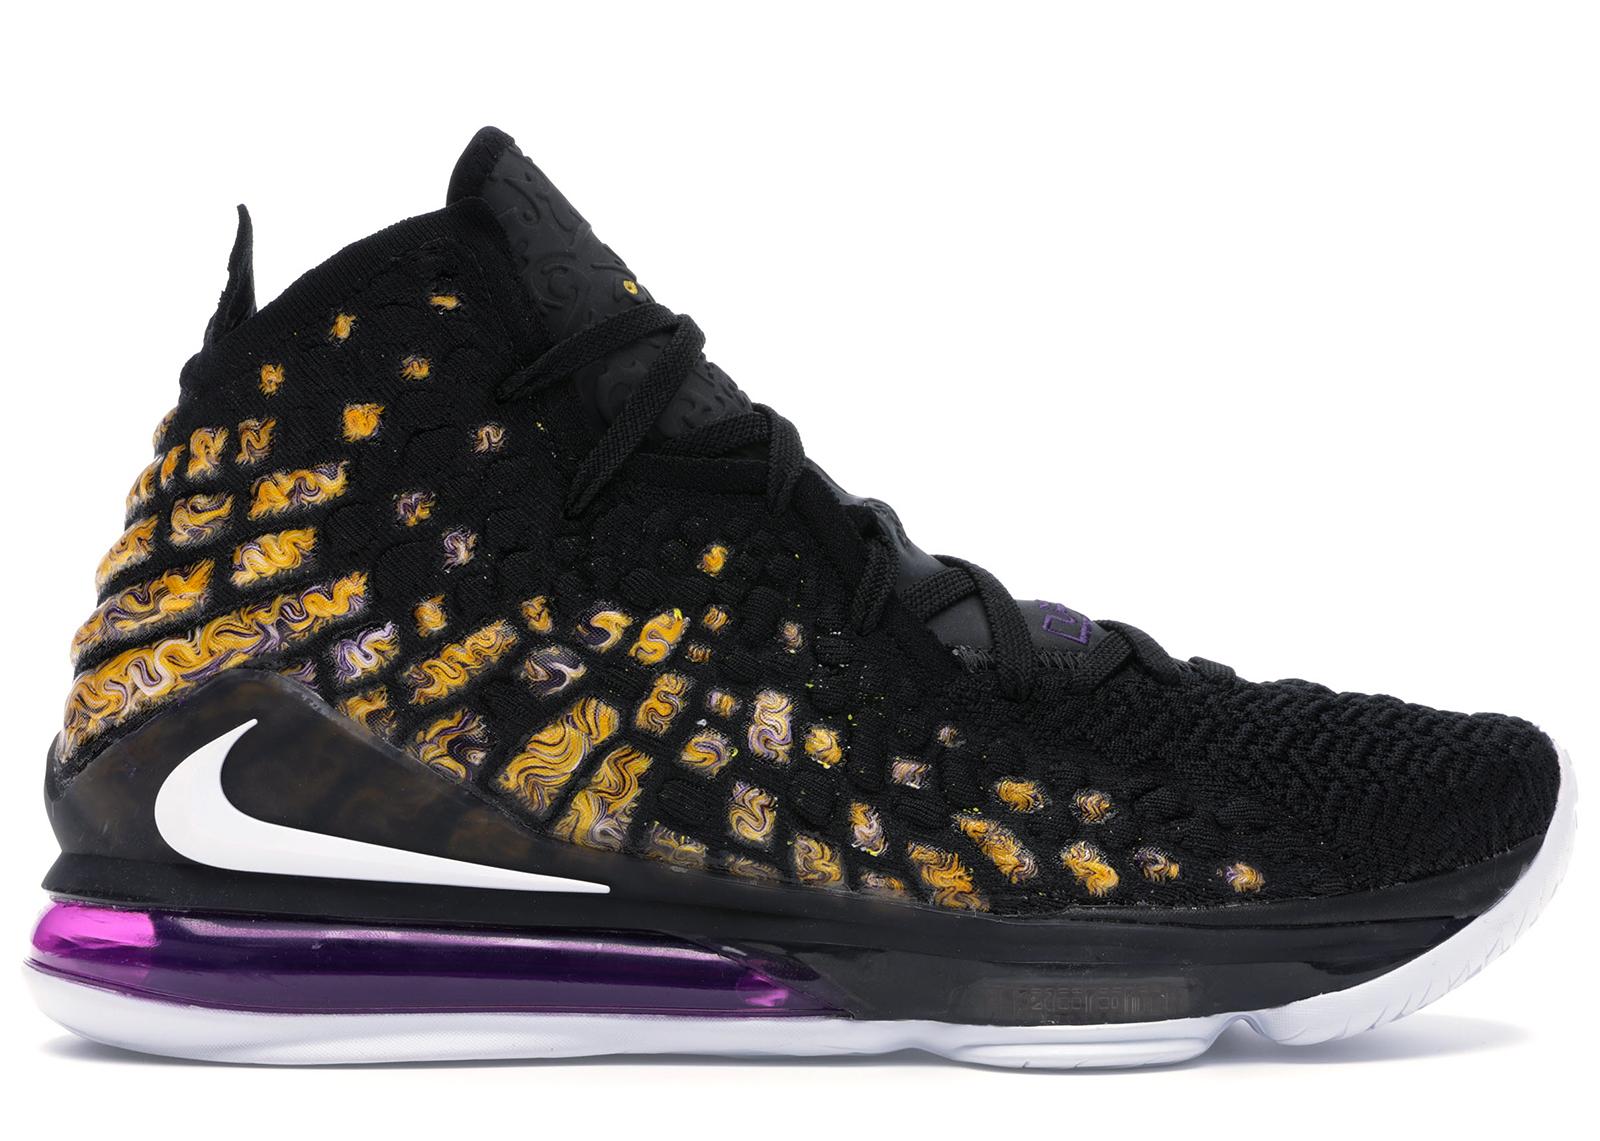 Nike LeBron 17 Lakers - BQ3177-004